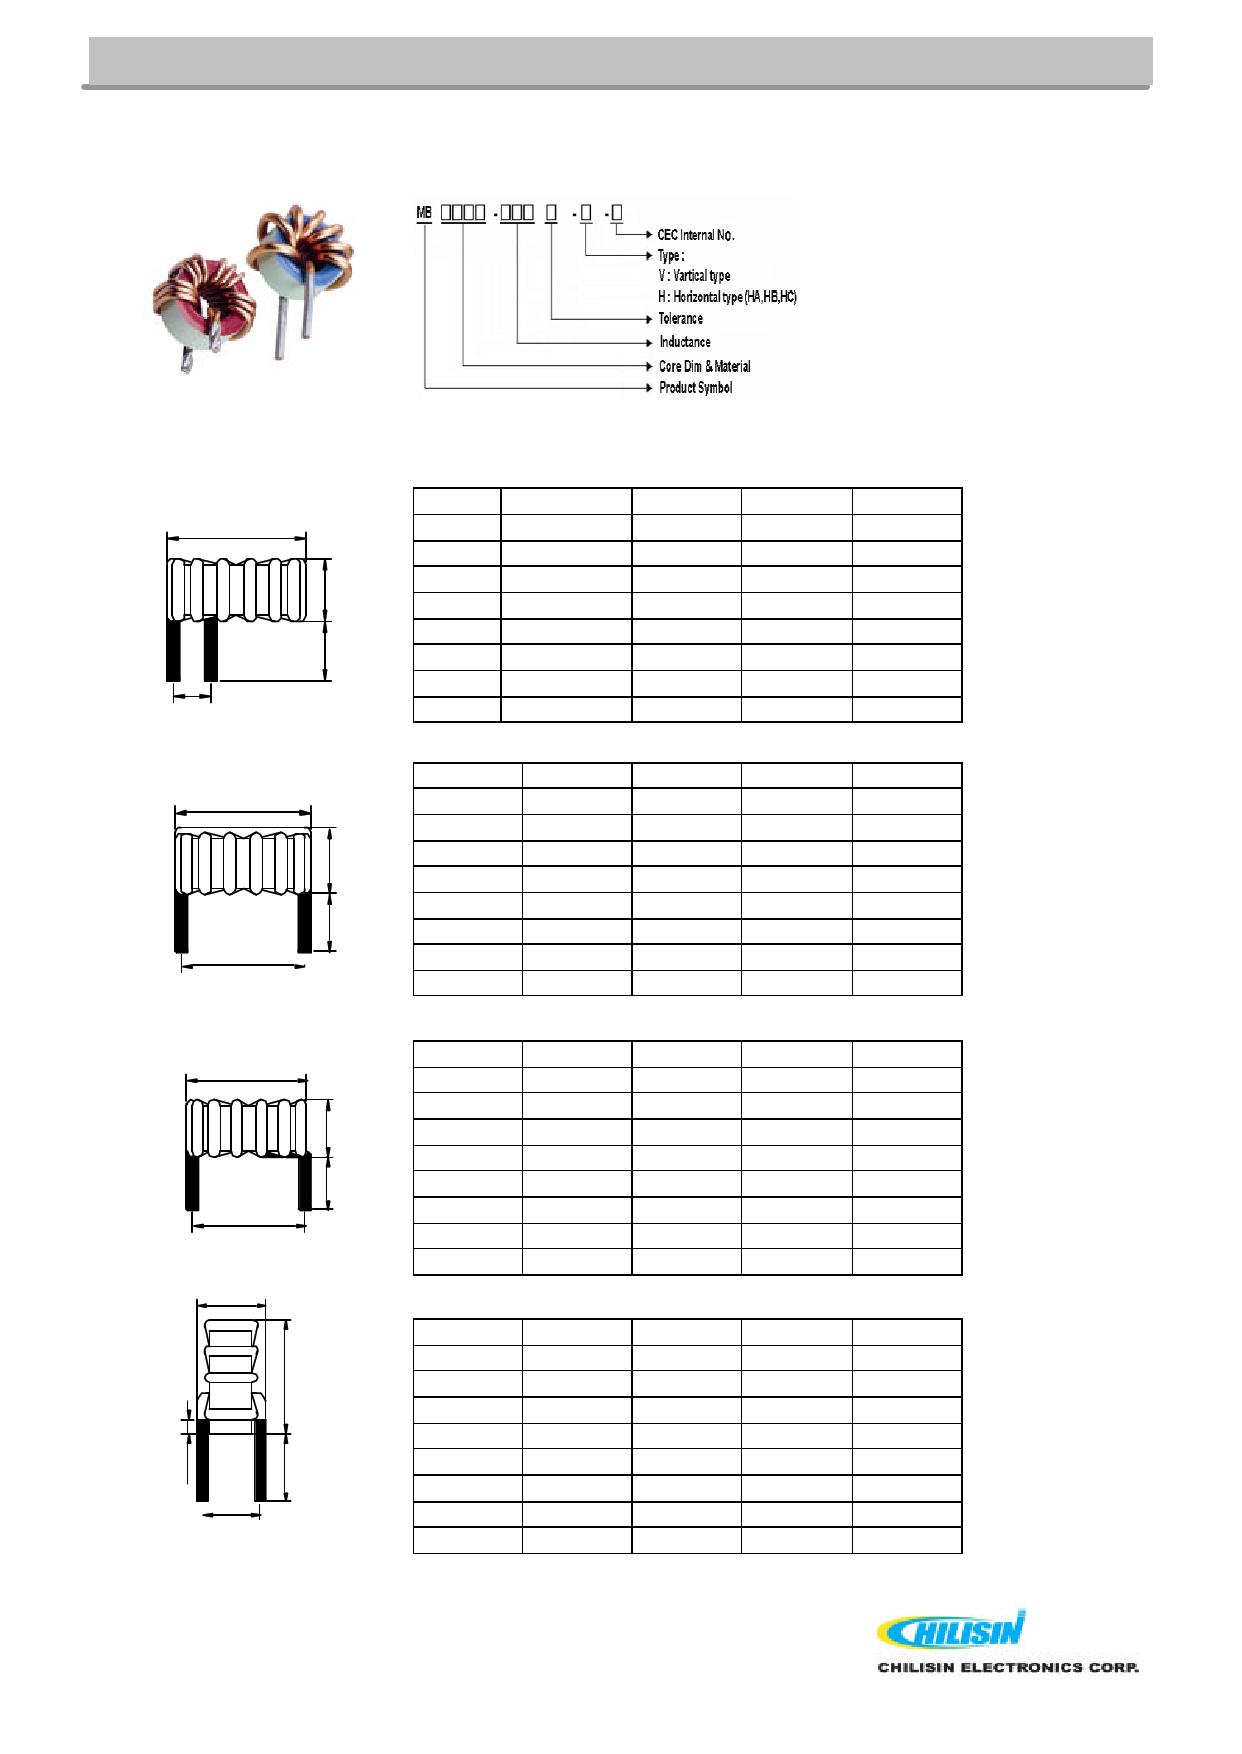 MB6052 데이터시트 및 MB6052 PDF